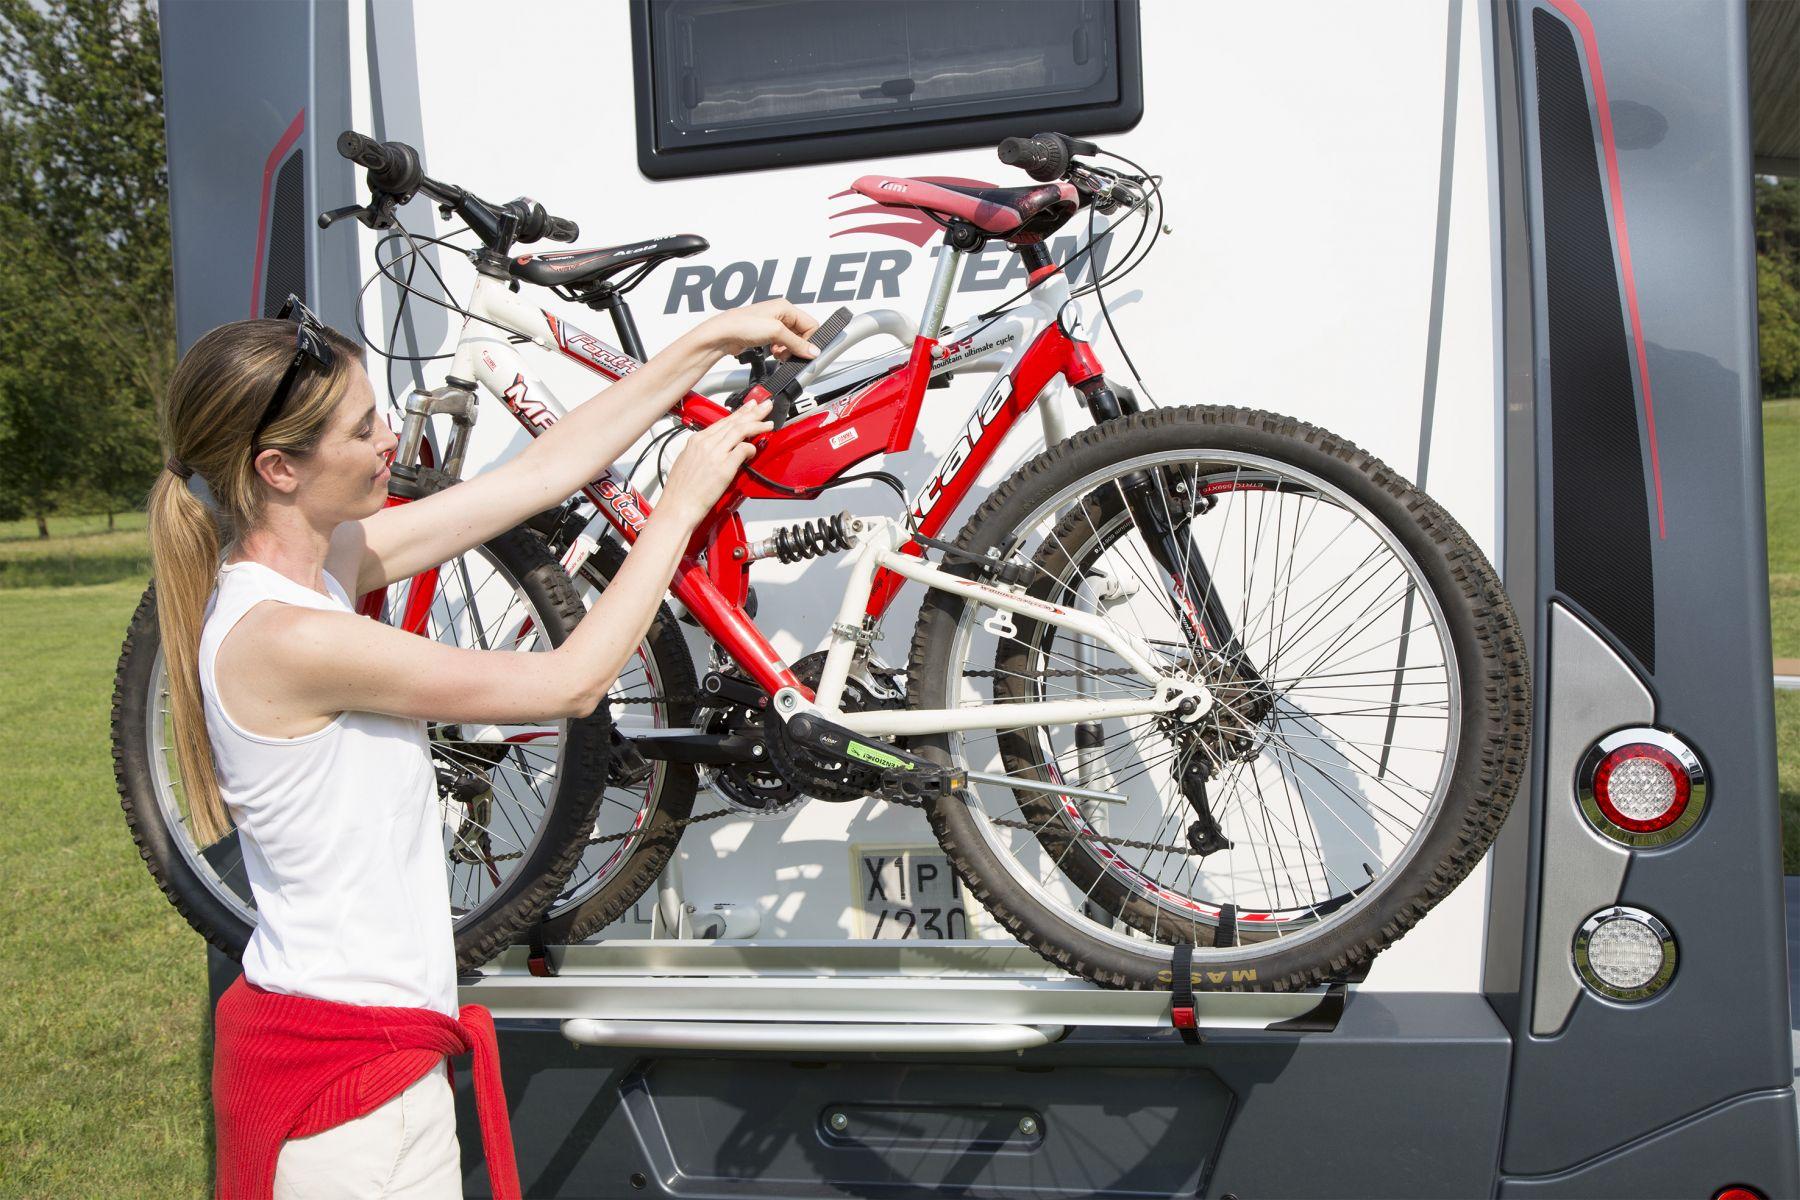 Fiamma Bike Block Pro 4 Blocking System for Bikes